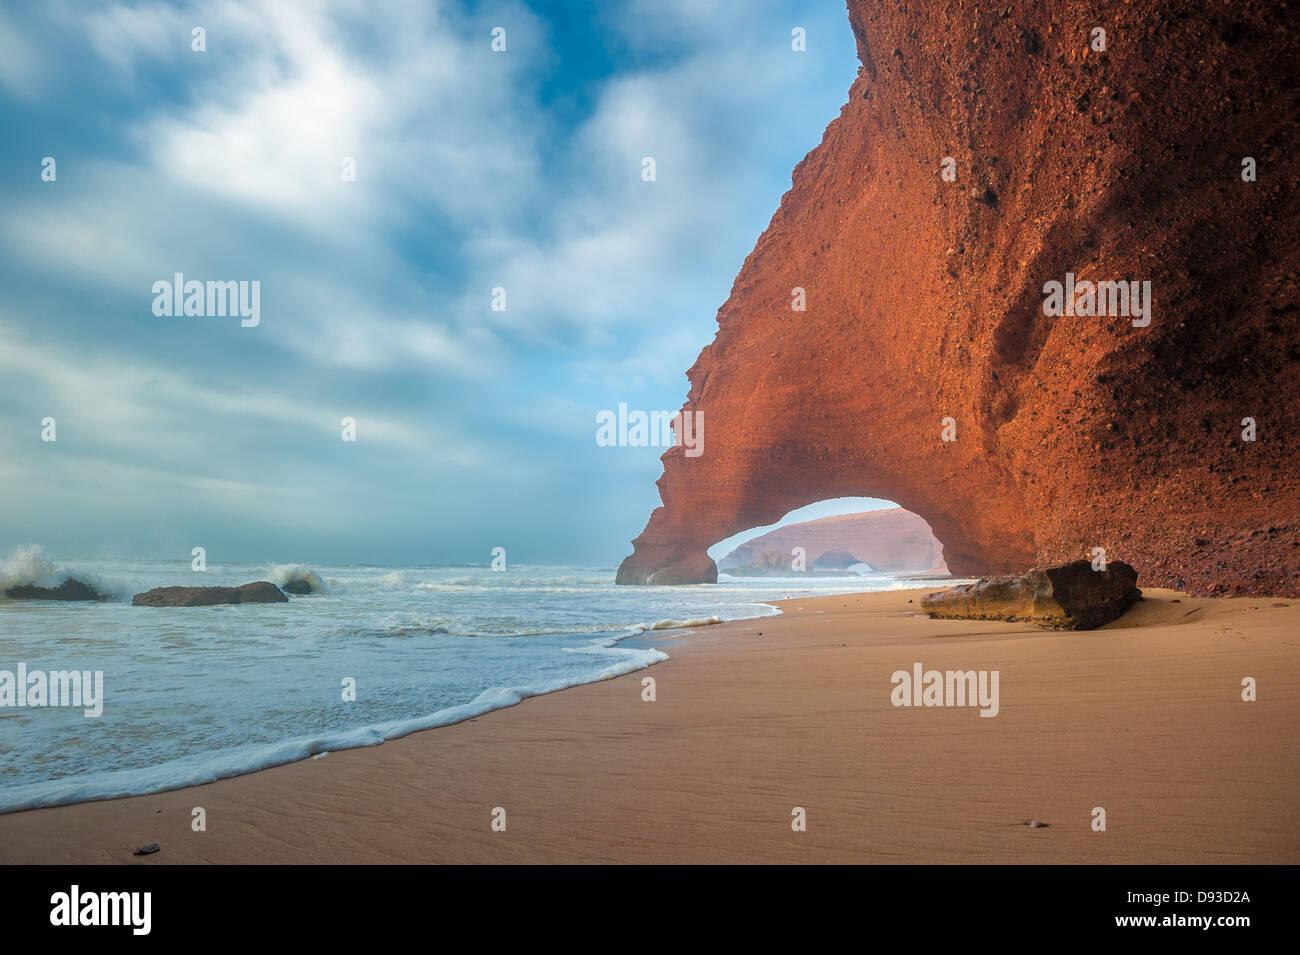 Legzira beach, Morocco - Stock Image